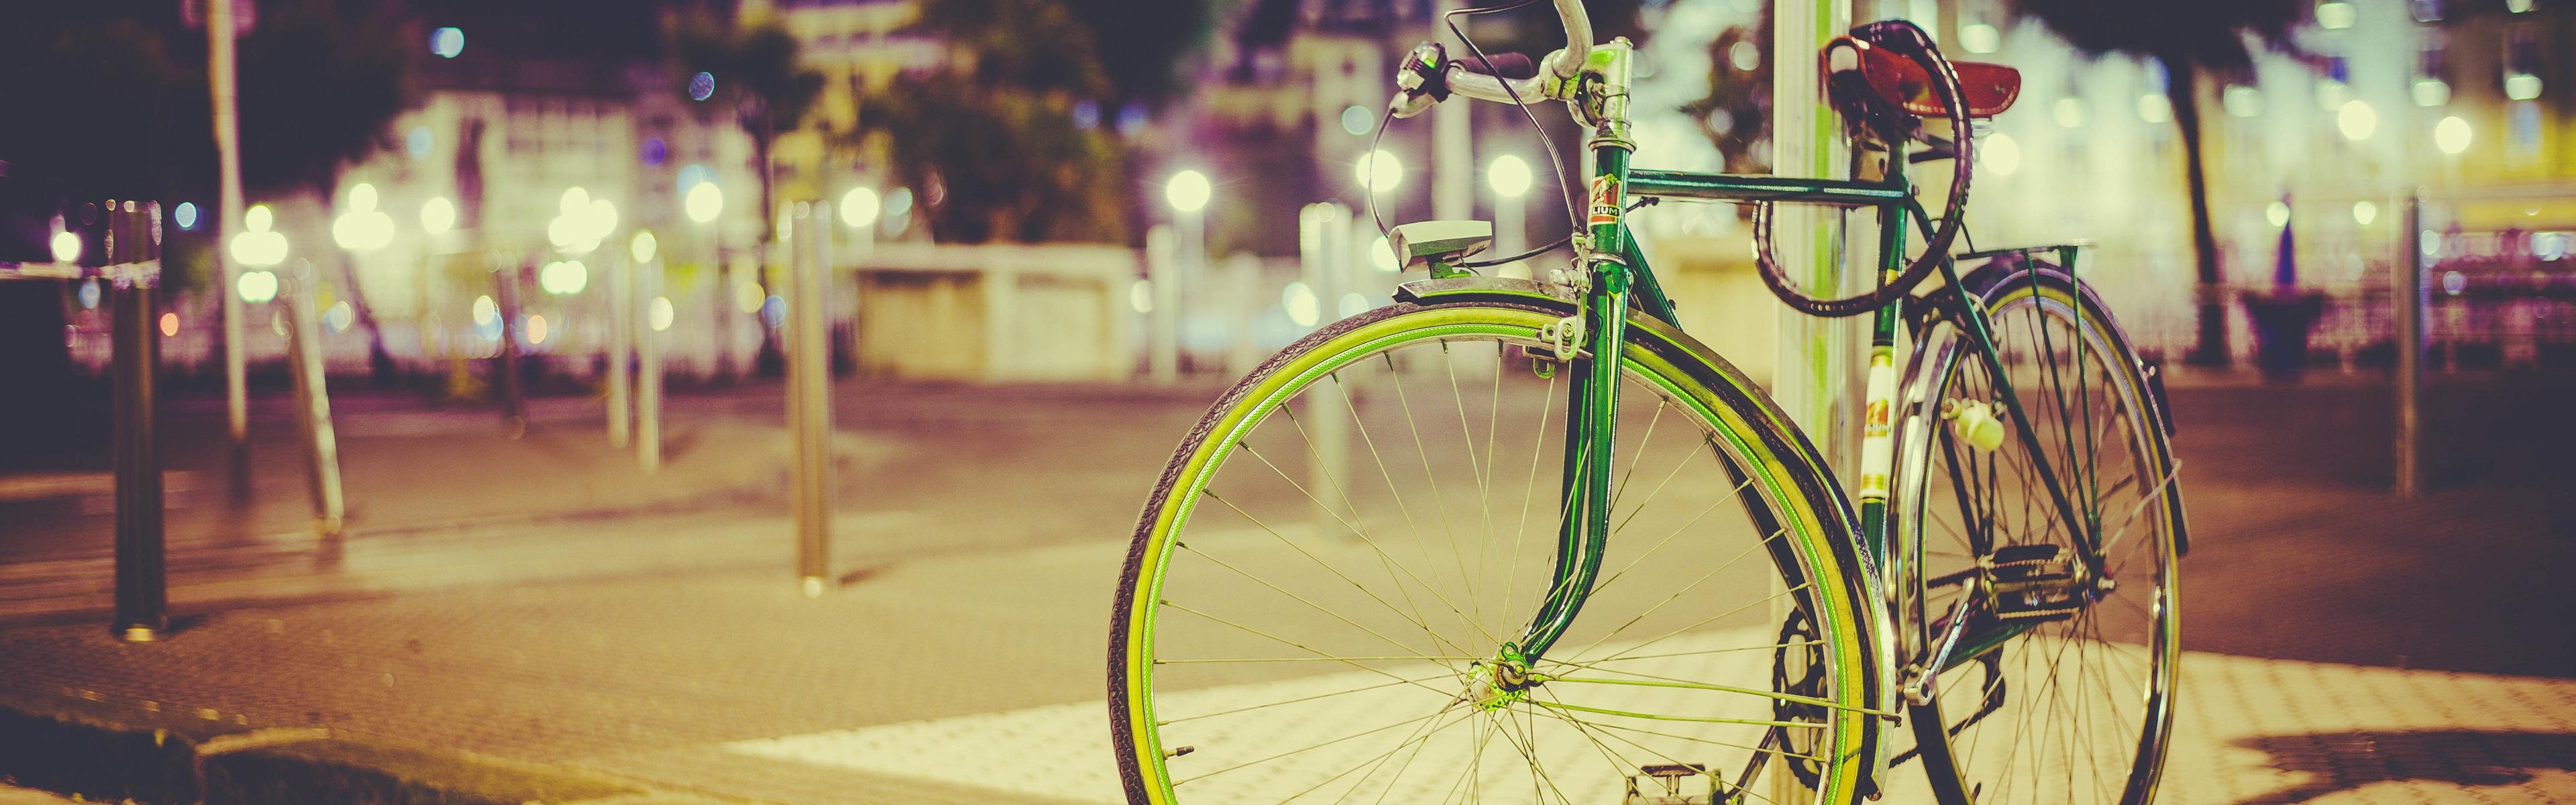 Wallpaper Bike, lamp post, city night, lights 3840x2160 UHD 4K ...